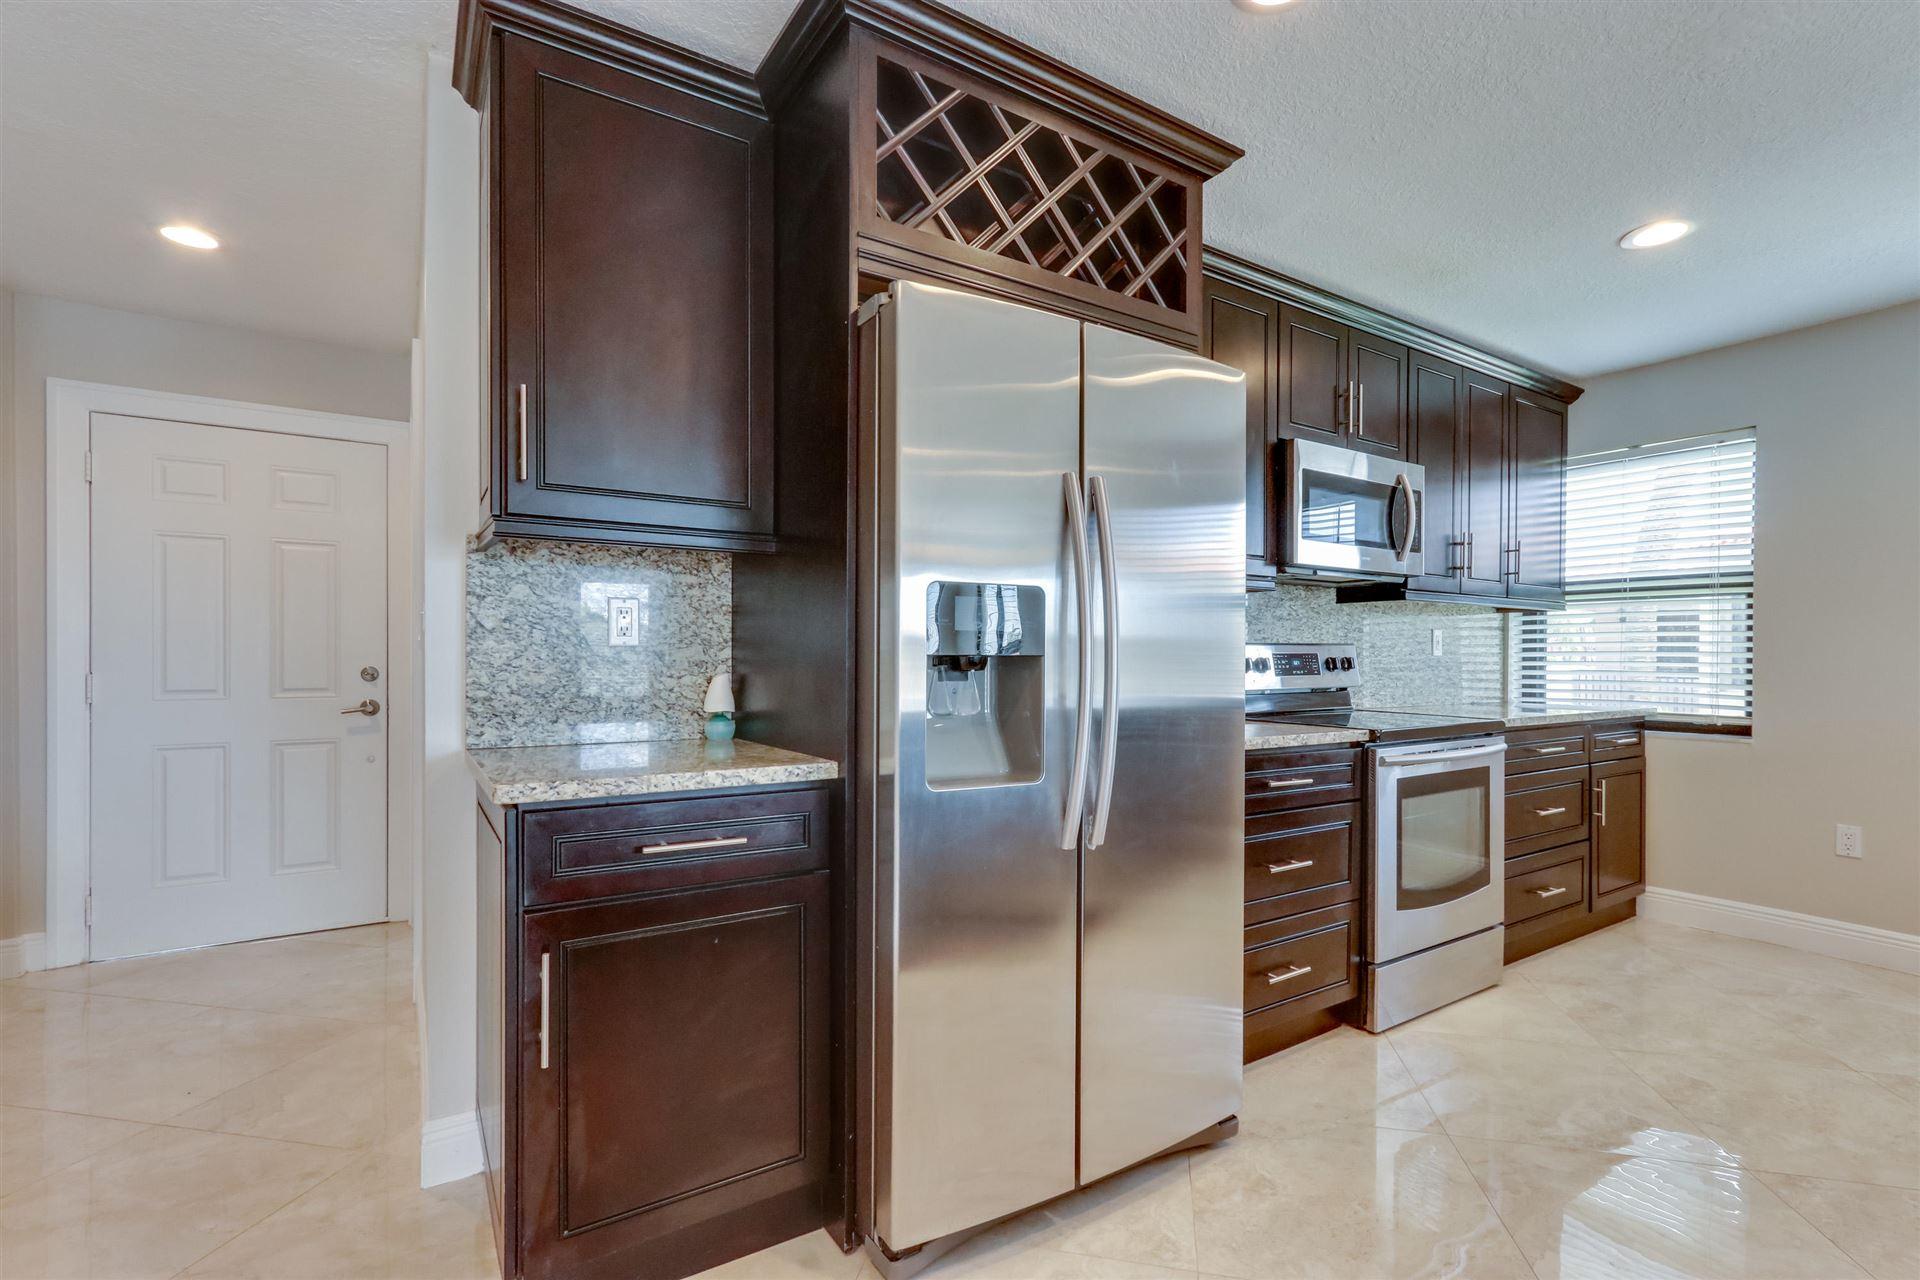 6646 Villa Sonrisa Drive #520, Boca Raton, FL 33433 - #: RX-10662524